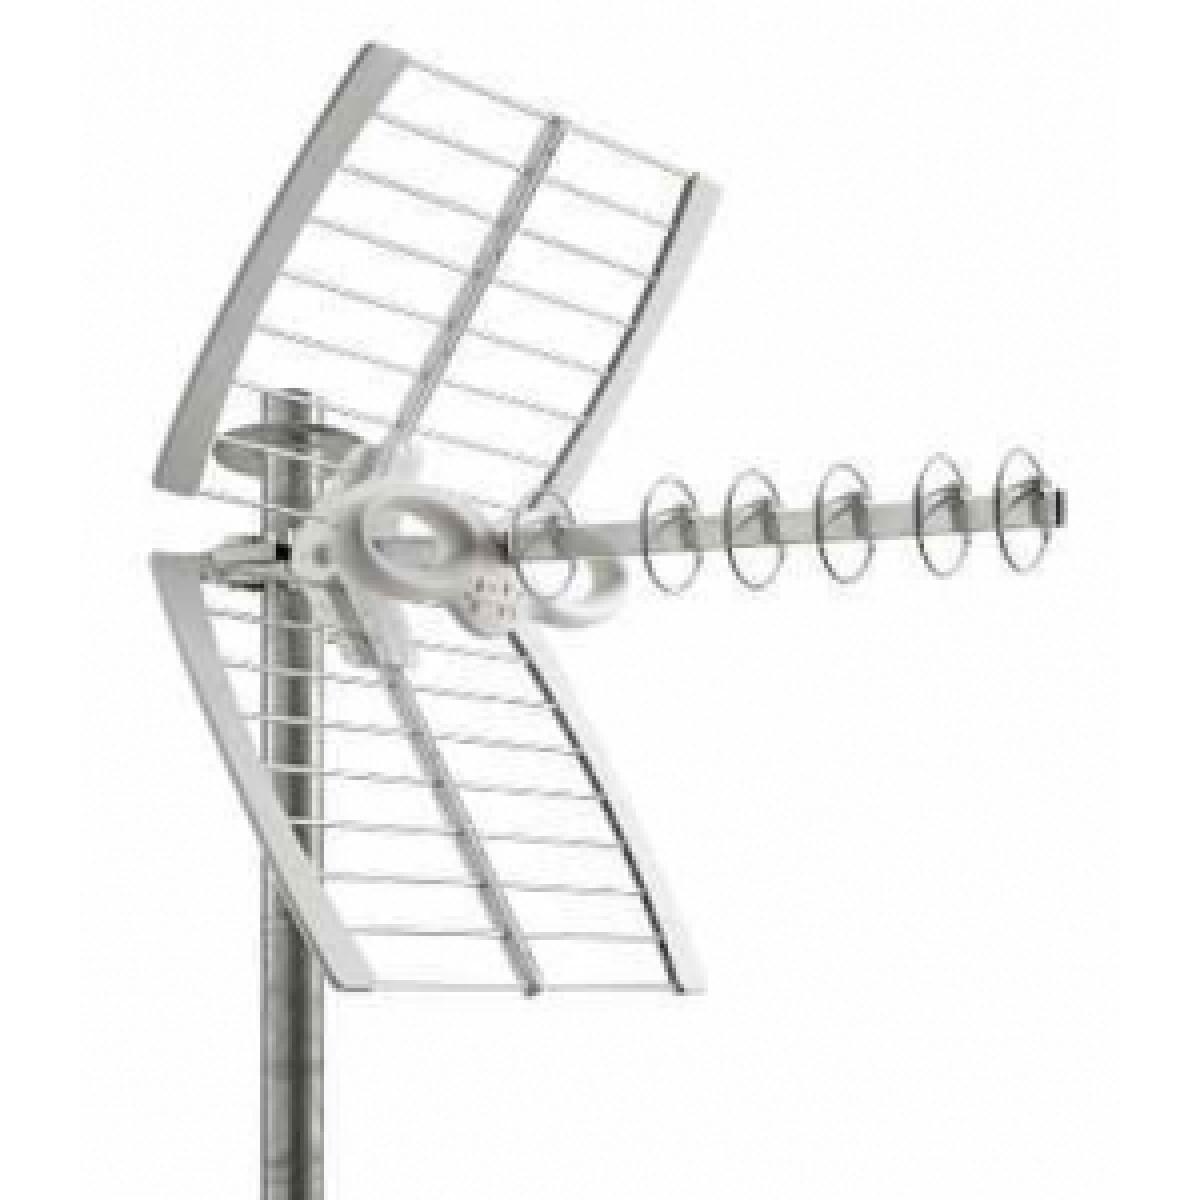 Antenna sigma 6hd lte u sigma 6hd lte 213219 fracarro